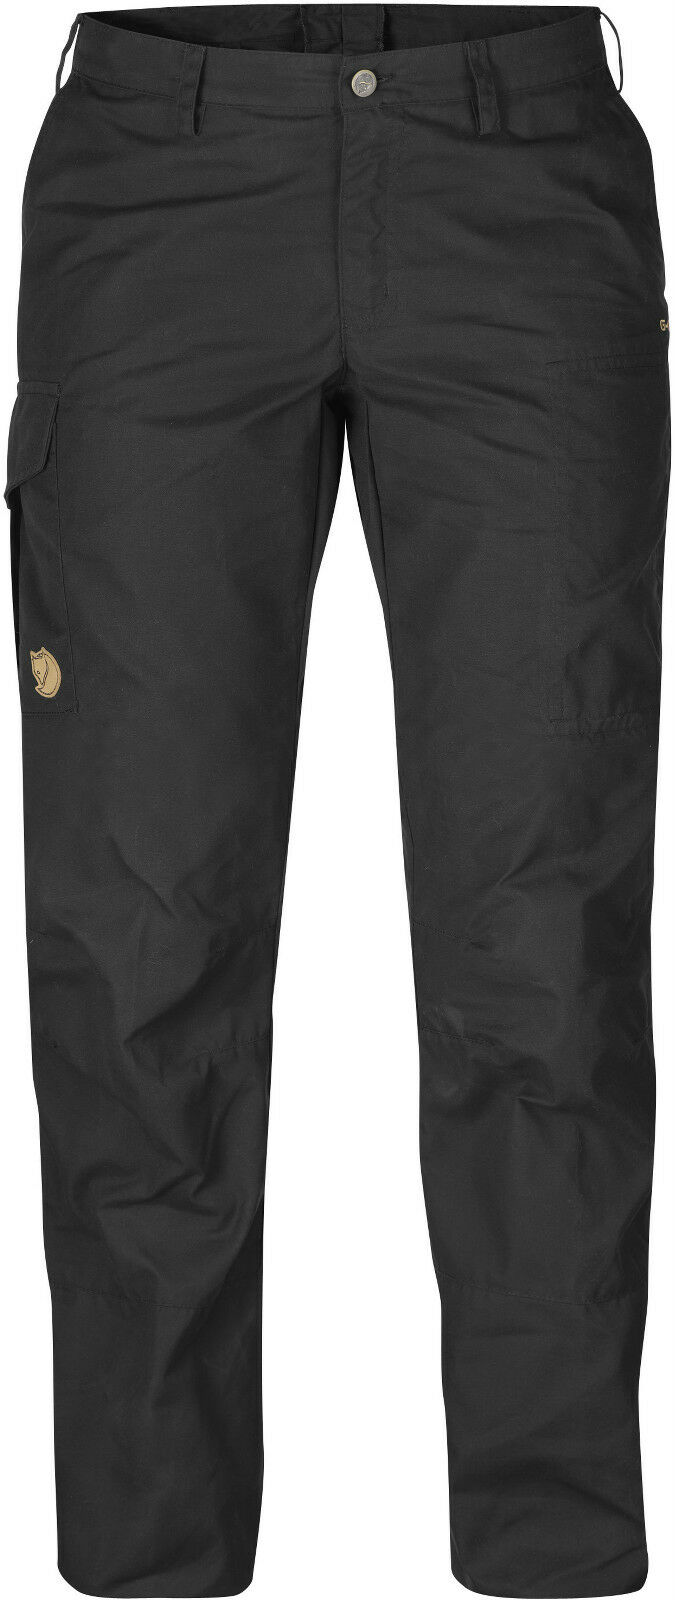 Fjällräven Karla G-1000 Pro Curved Trousers 89727 dark Grau  G-1000 Karla Damen Outdoorhose 87b237